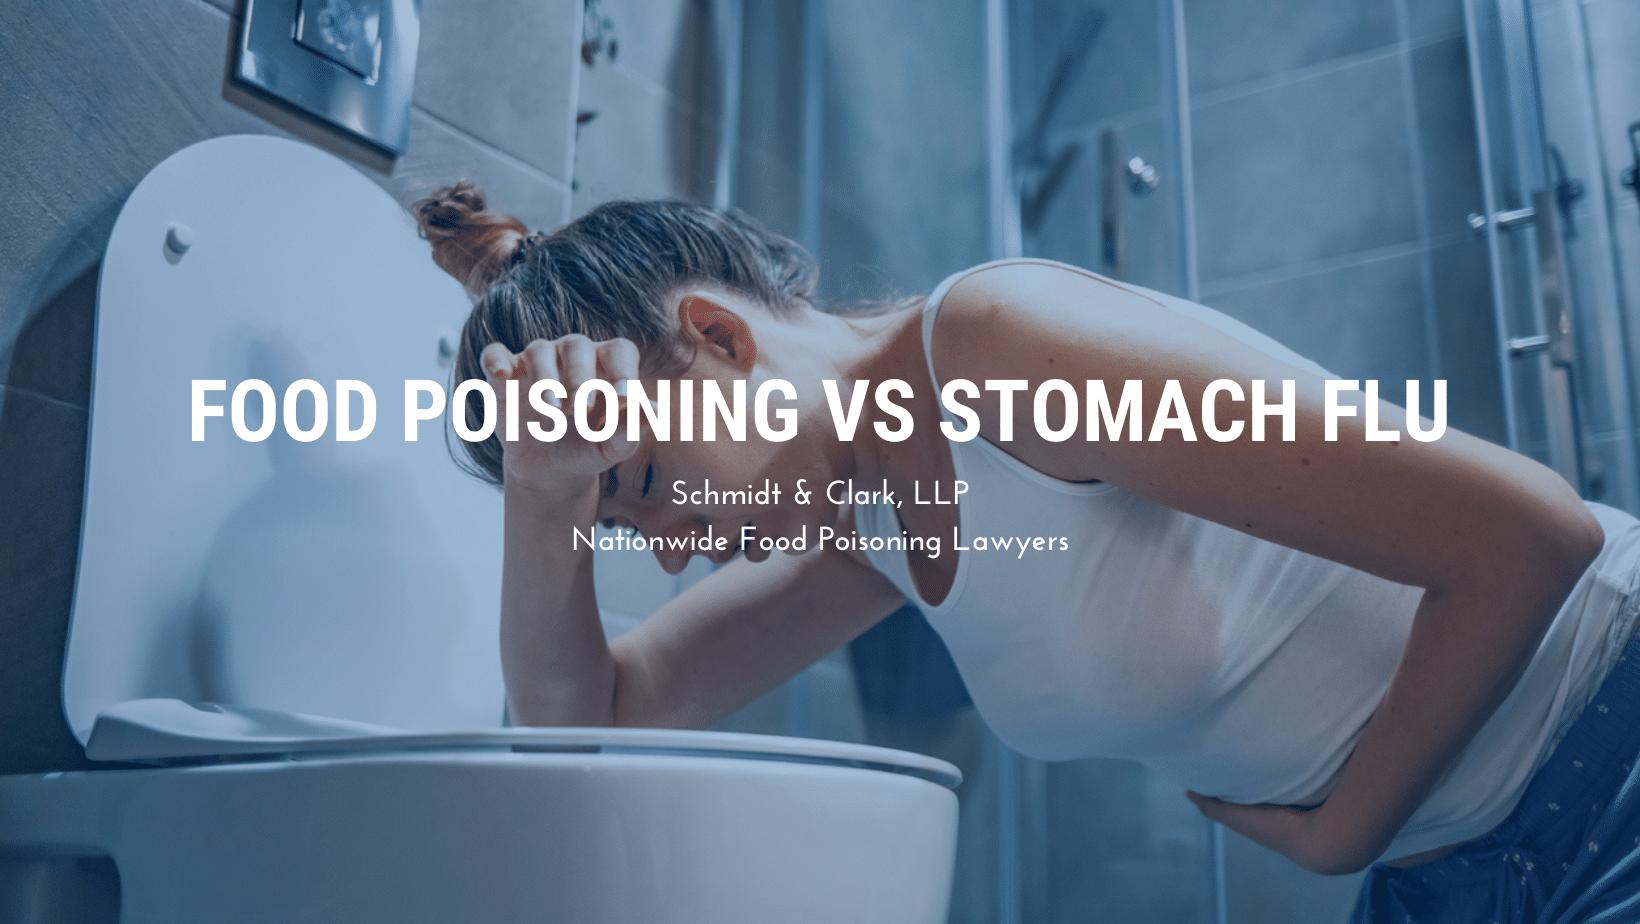 Food Poisoning vs stomach flu